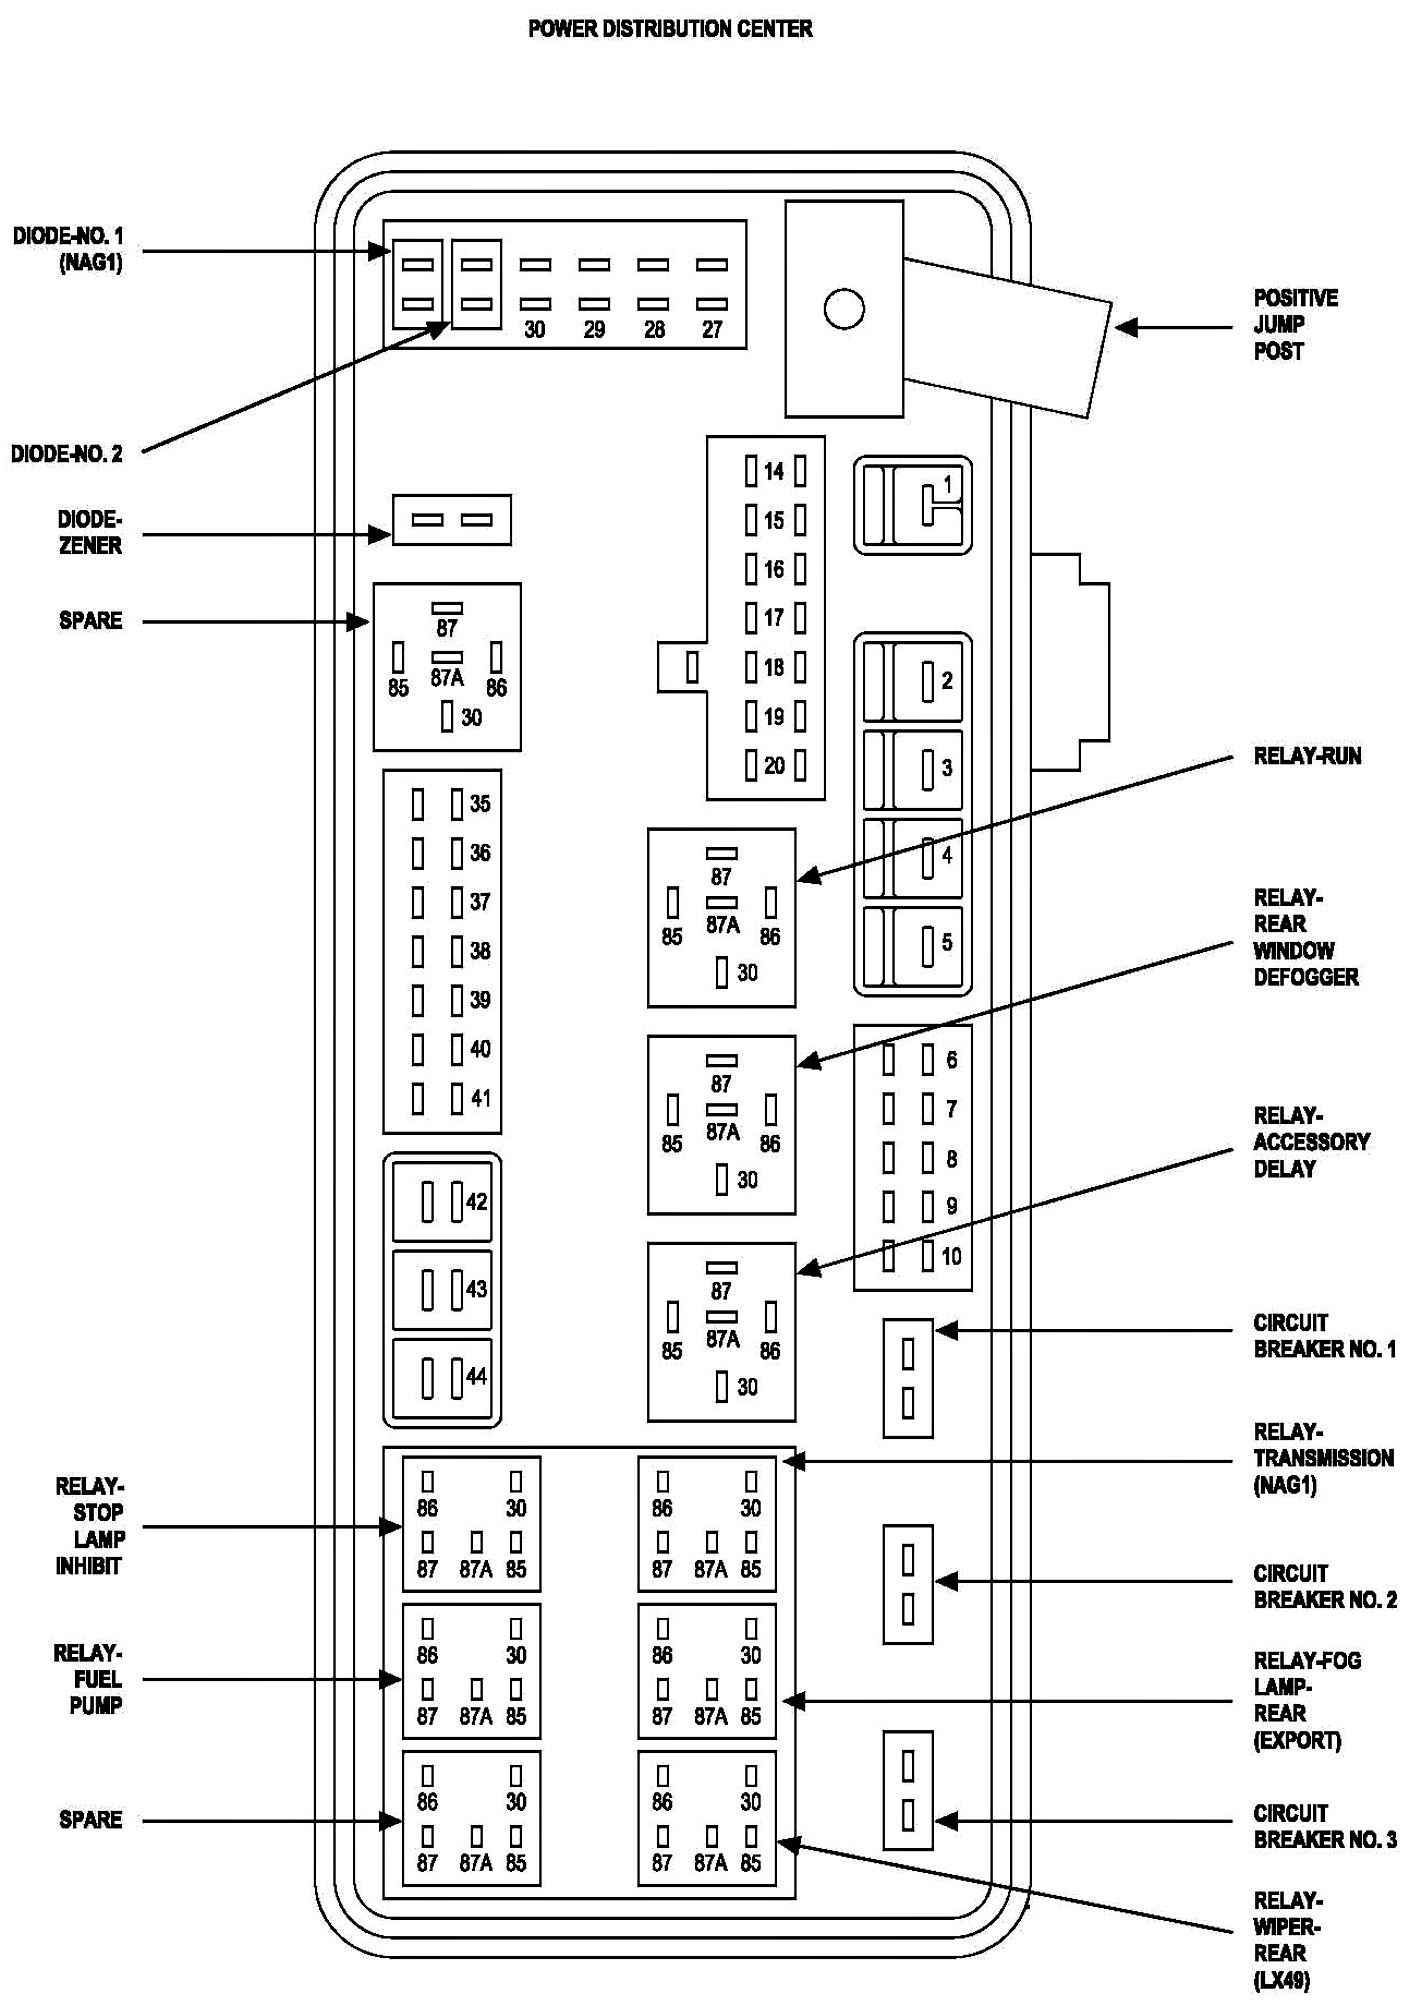 2005 Dodge Magnum Fuse Box - North Star 157309 Wiring Diagram for Wiring  Diagram SchematicsWiring Diagram Schematics